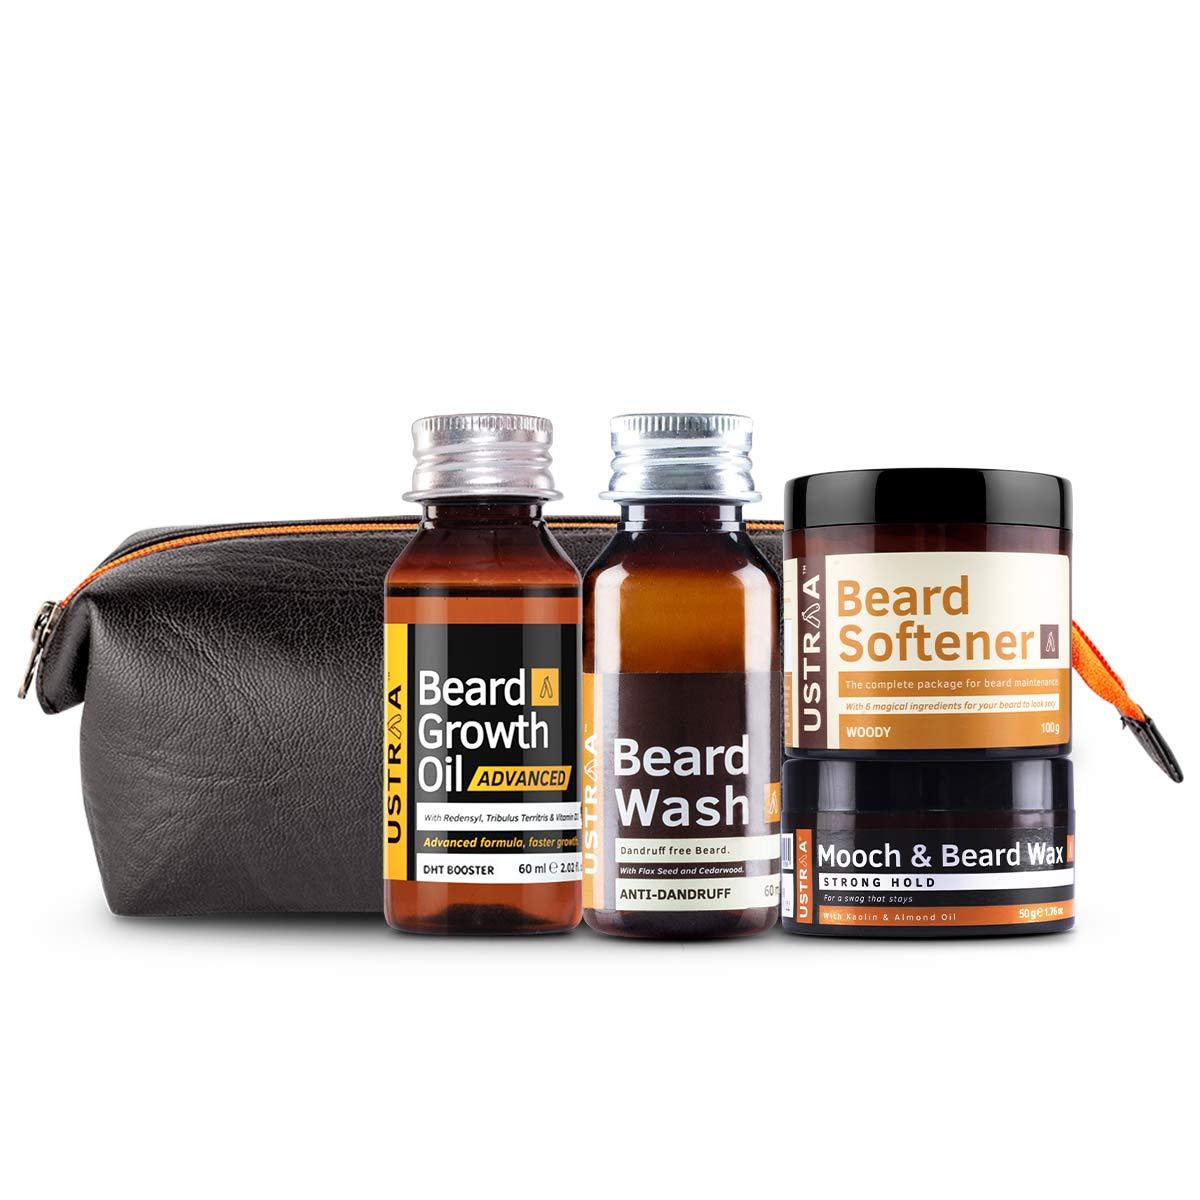 Ustraa | Ustraa Beard Growth oil Advanced60 ml, Anti Dandruff Beard Wash 60 ml, Mooch and Beard Wax 50 g, Beard Softener 100 g & PU kit Bag